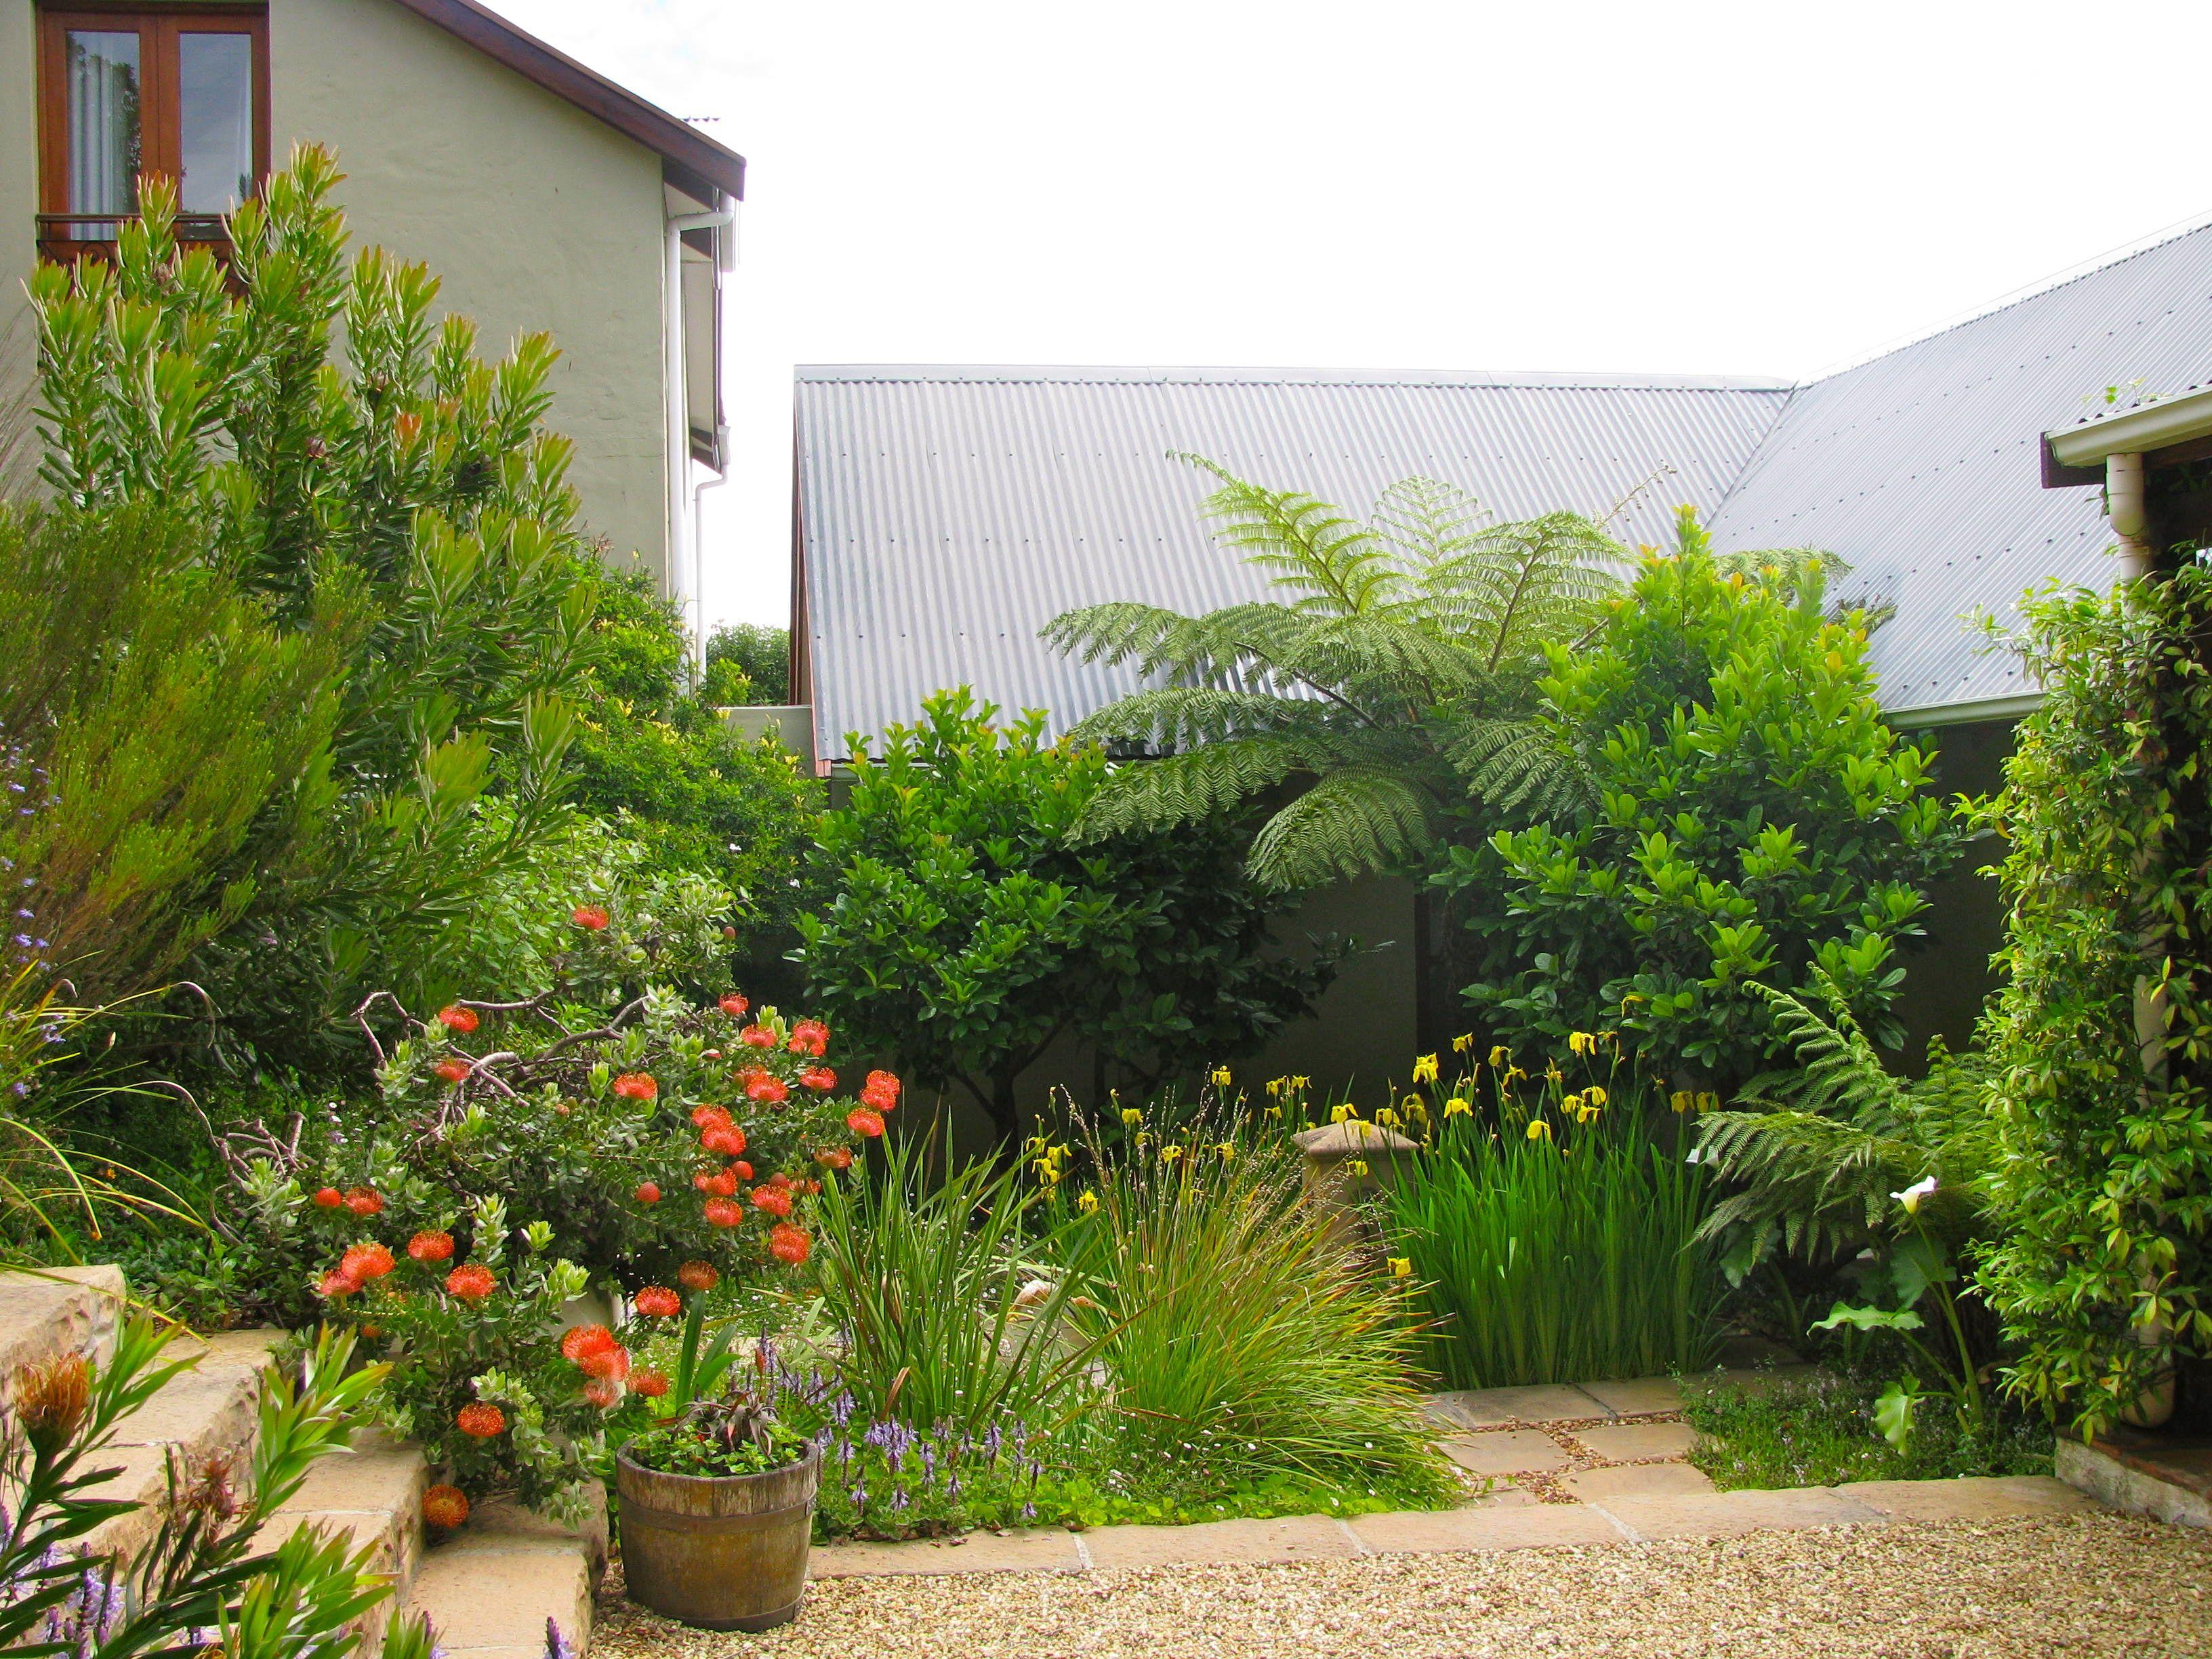 Pin By Hillary Hankey On Garden Ideas Small Garden Landscape